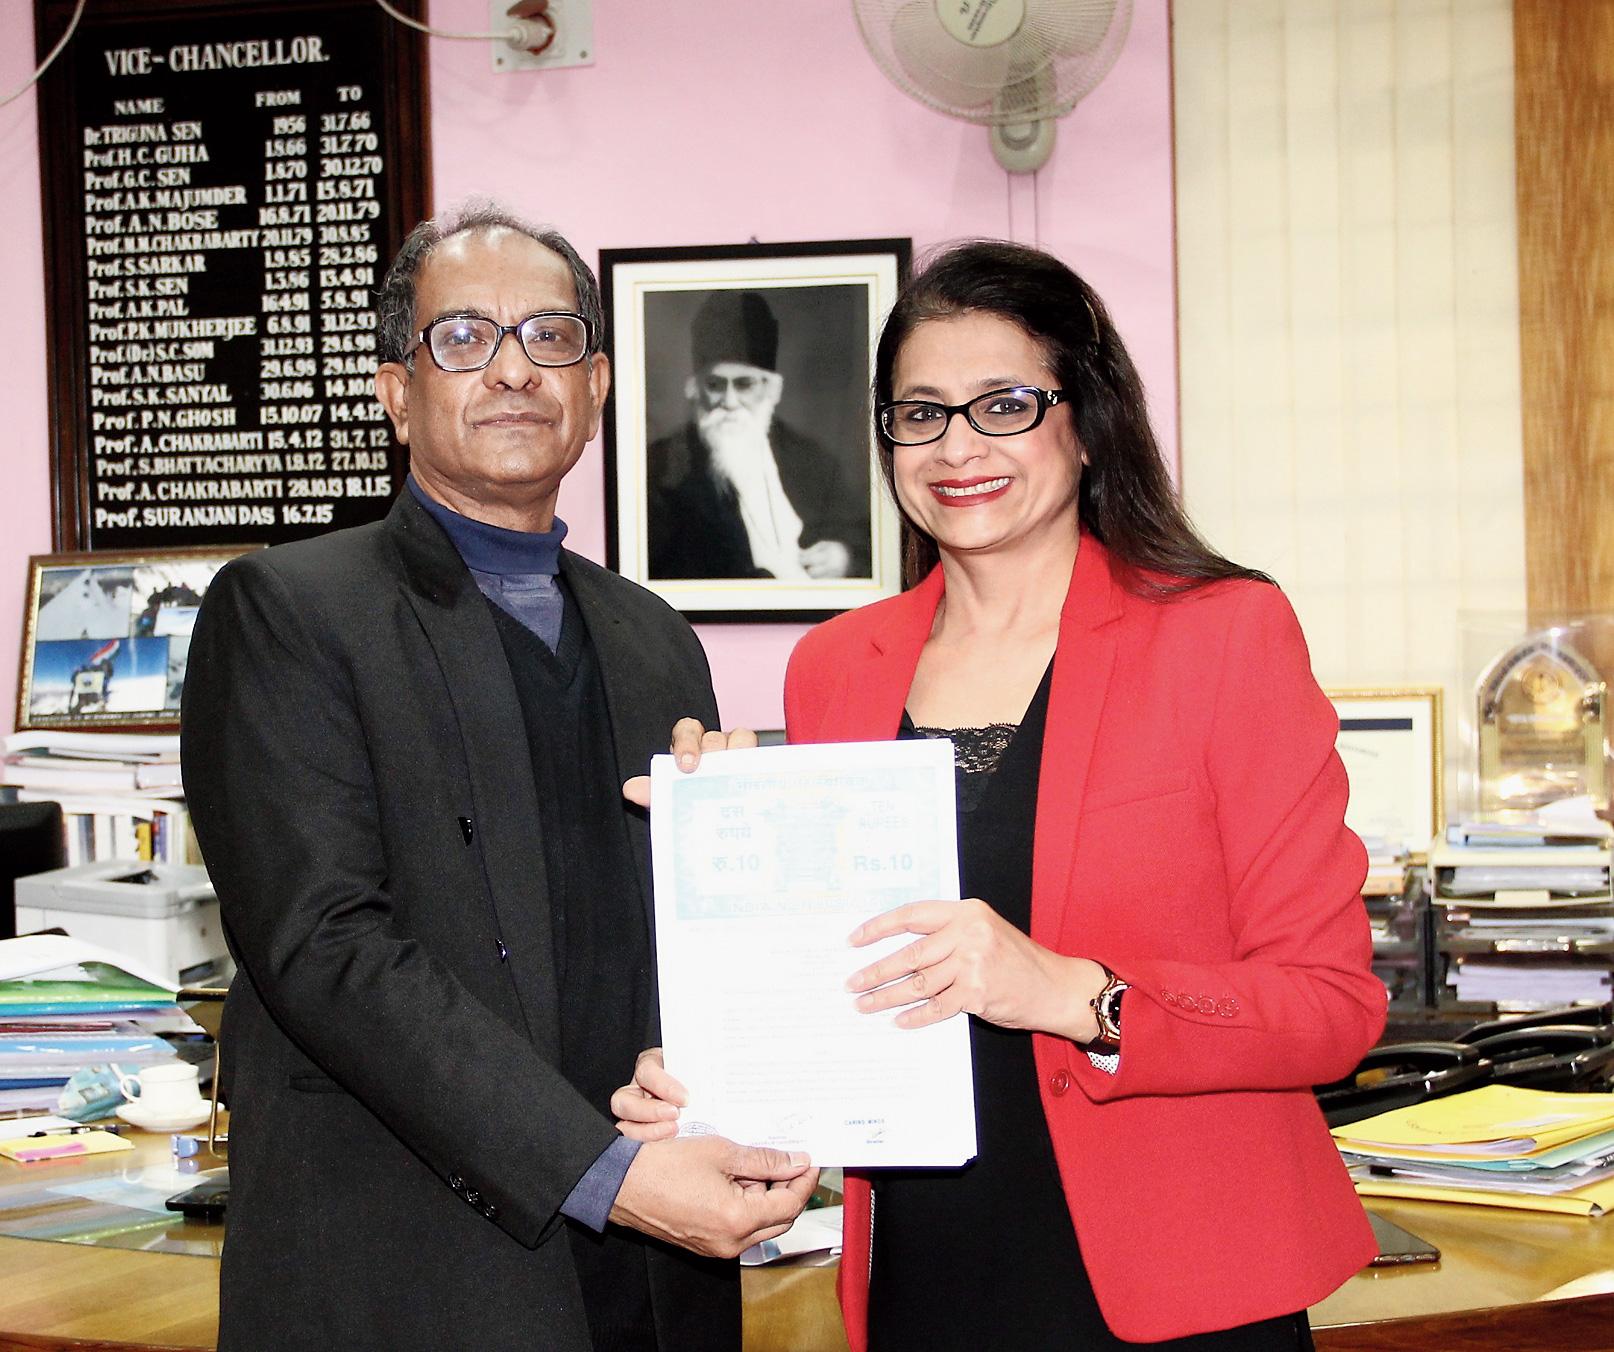 Vice-Chancellor Suranjan Das and Minu Budhia on Friday.